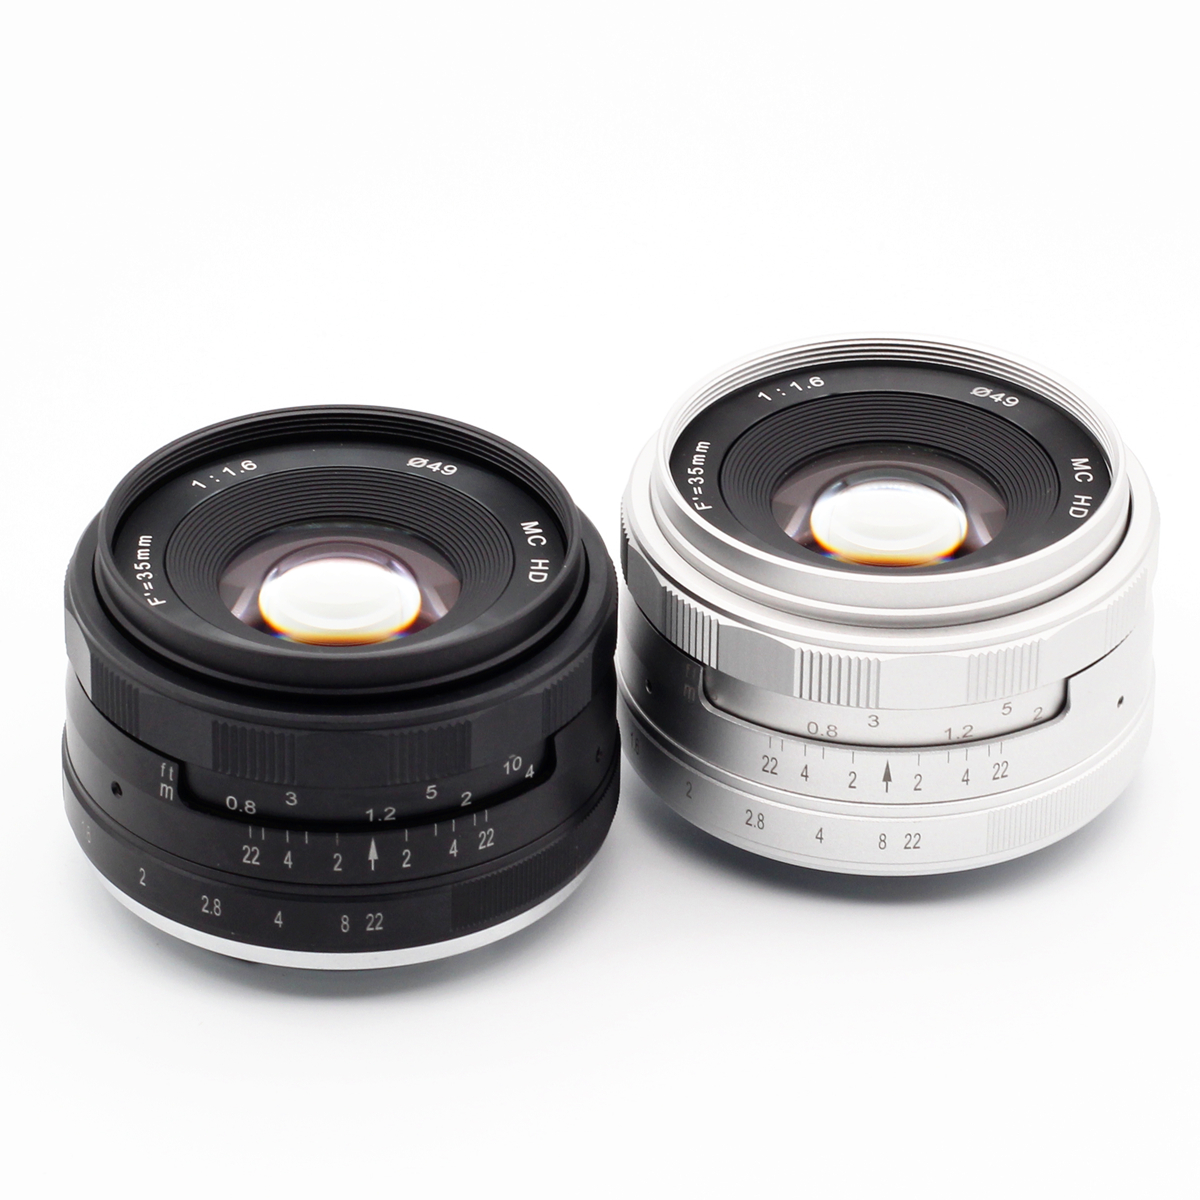 35mm f/1.6 objectif principal manuel pour Sony E monture NEX Canon EF-M EOS M Fujifilm FX X Olympus Pansonic M43 MFT Micro4/3 35mm F1.6